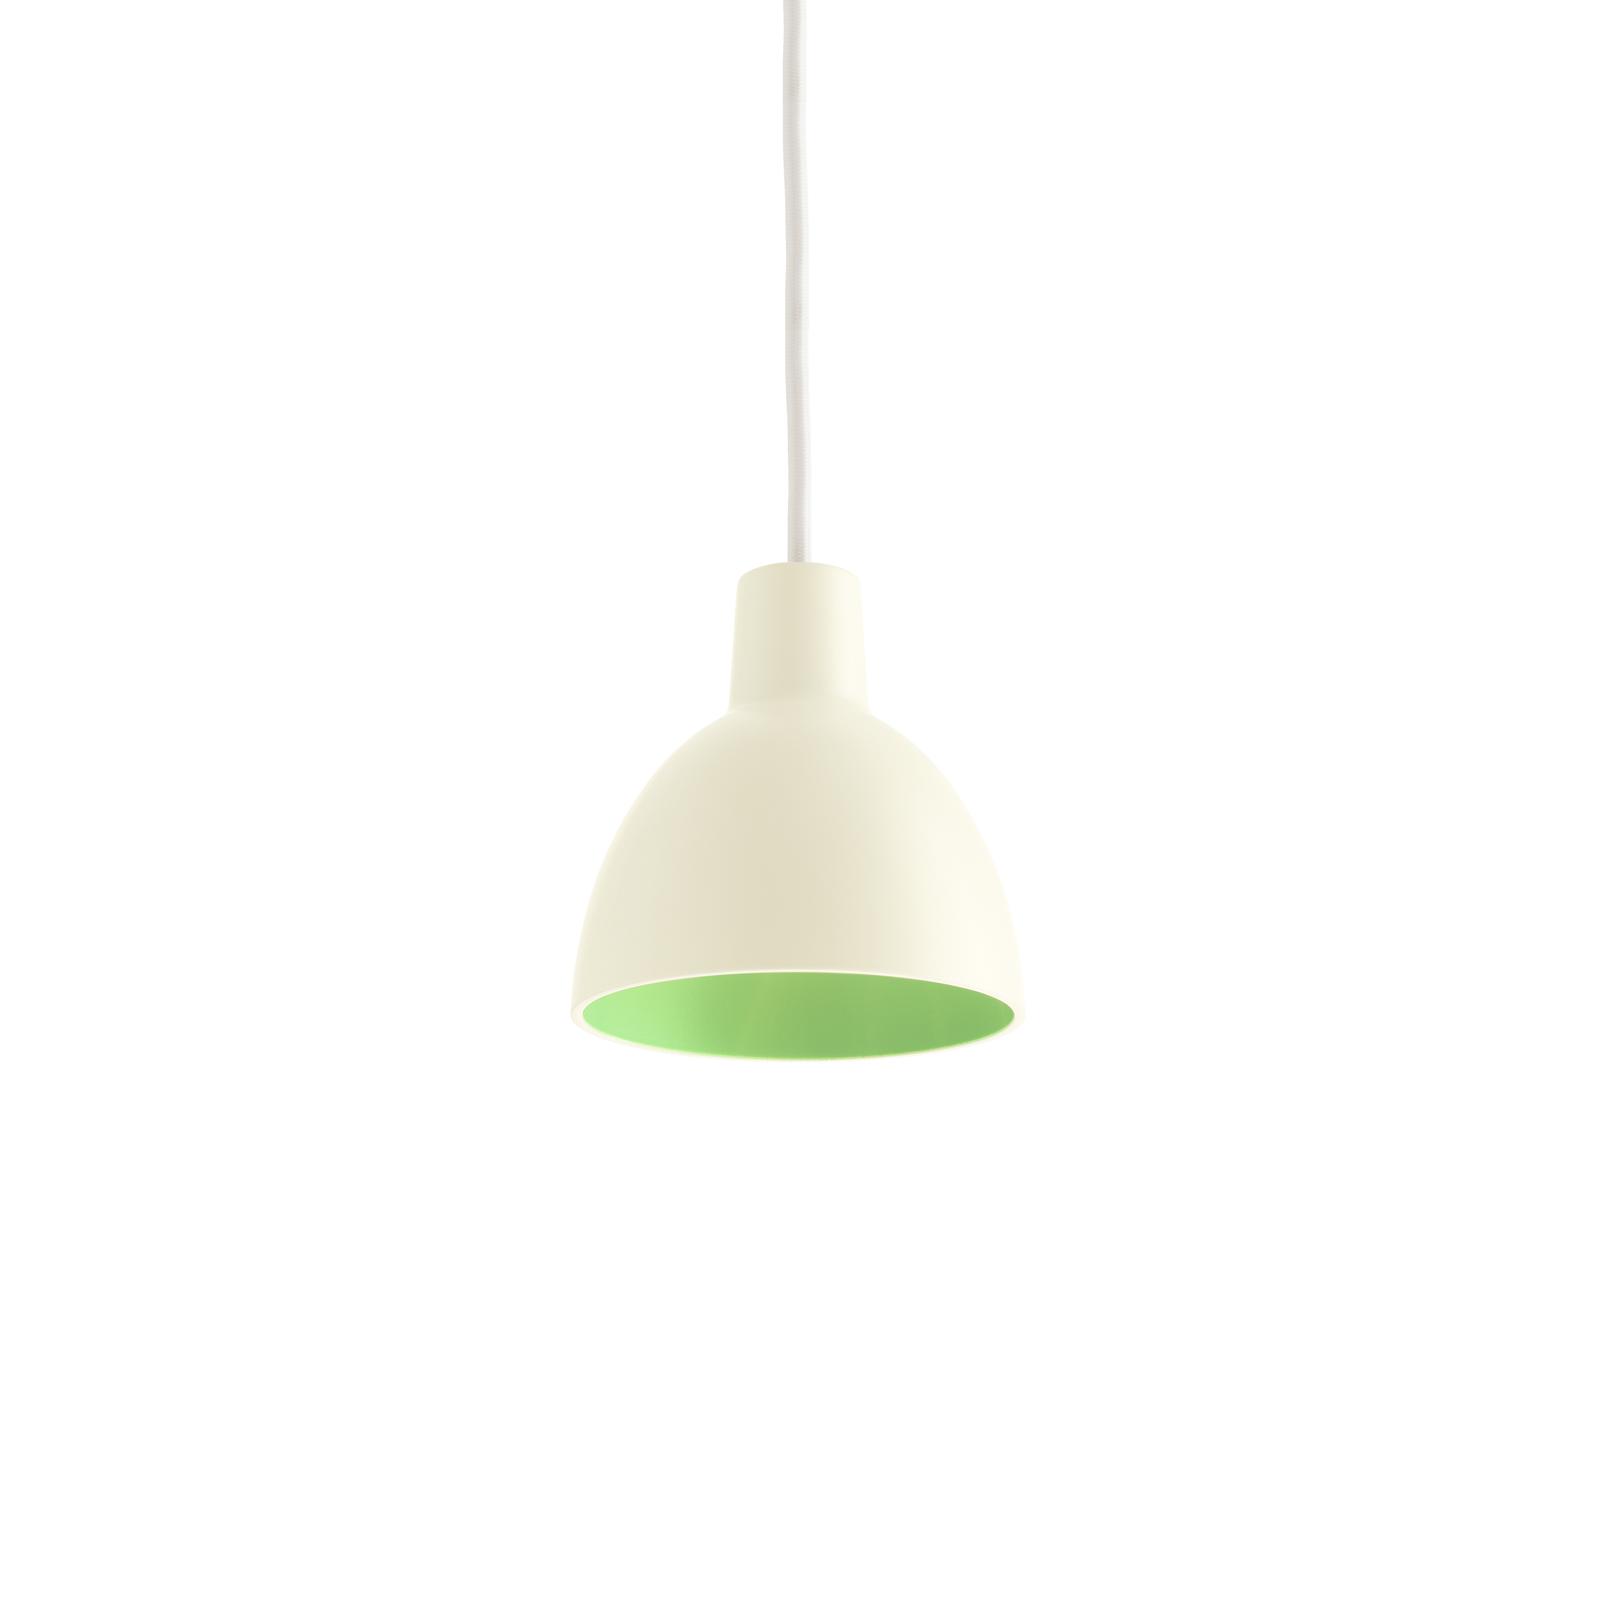 Louis Poulsen Toldpod 2120 Pendant Vit grön Glashusetmalmo 1